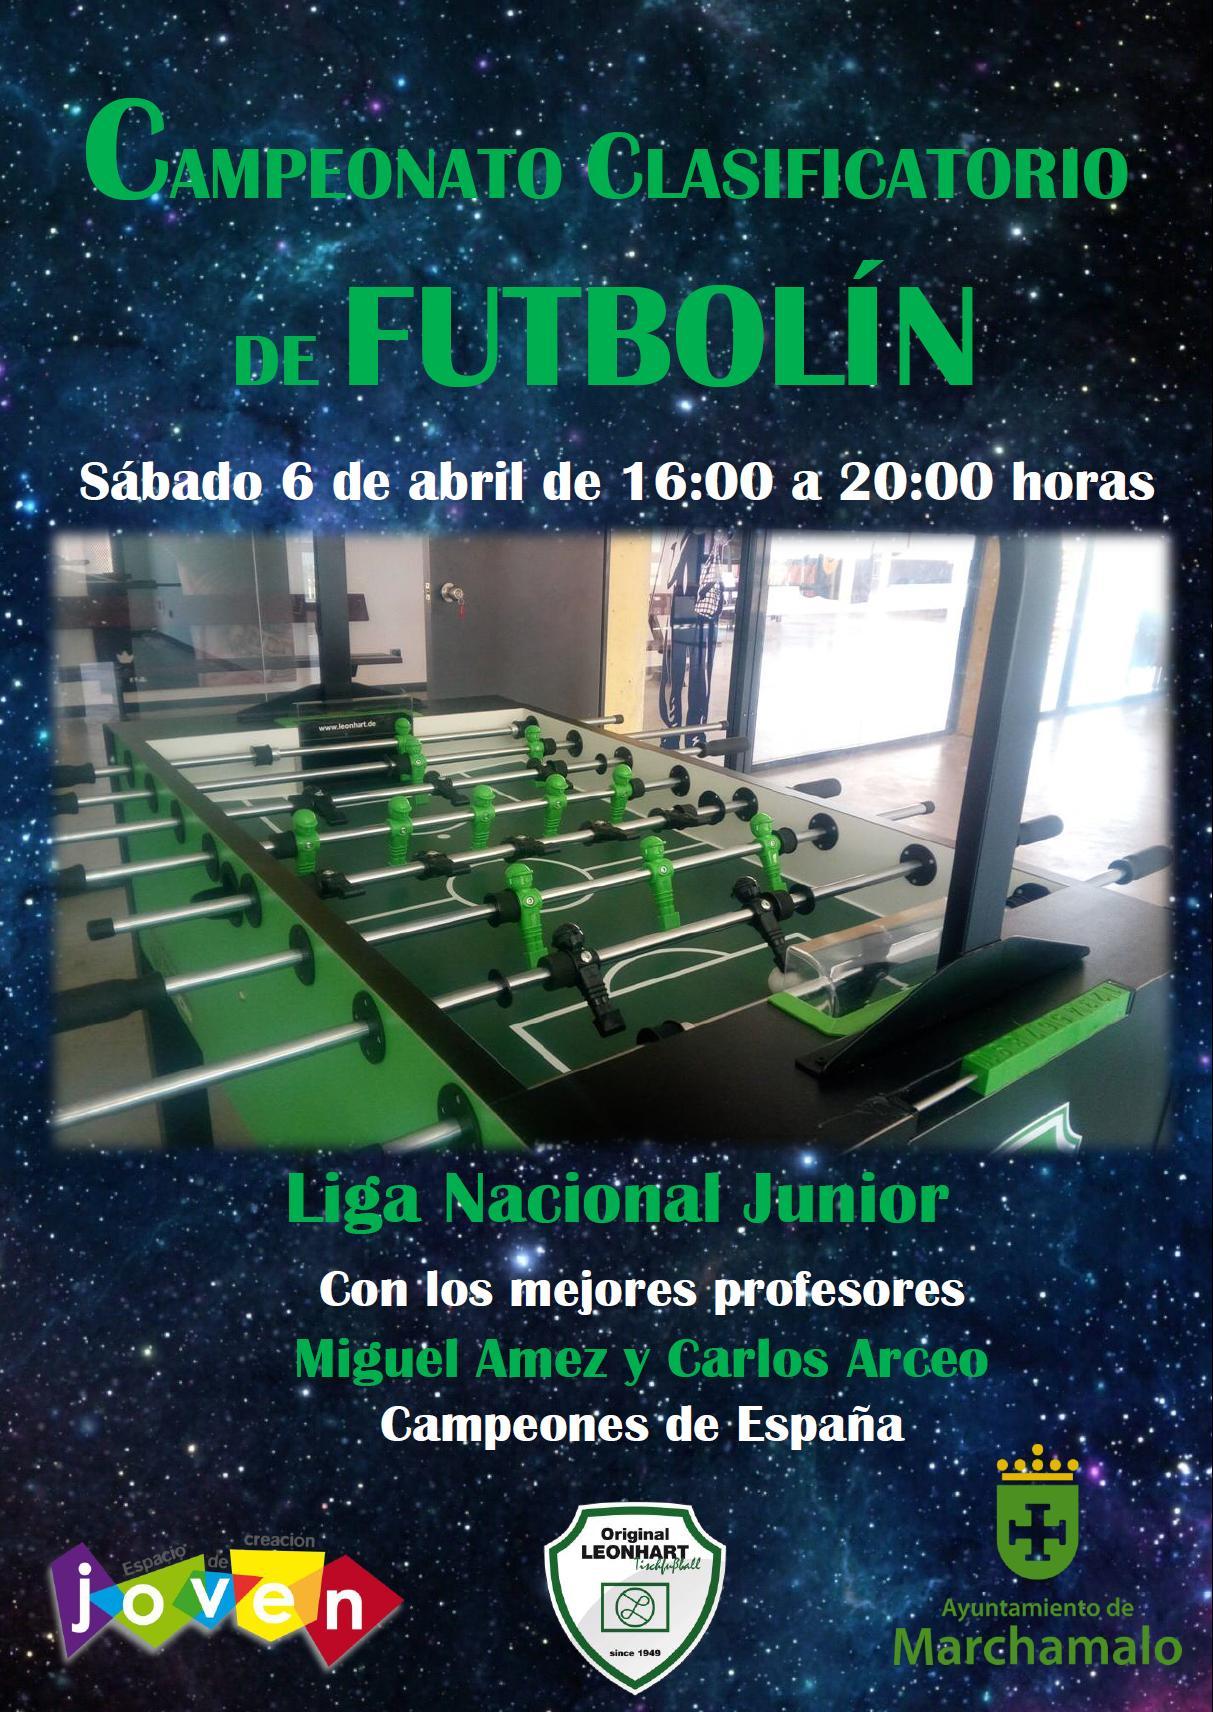 Cartel Campeonato Clasificatorio Futbolín.